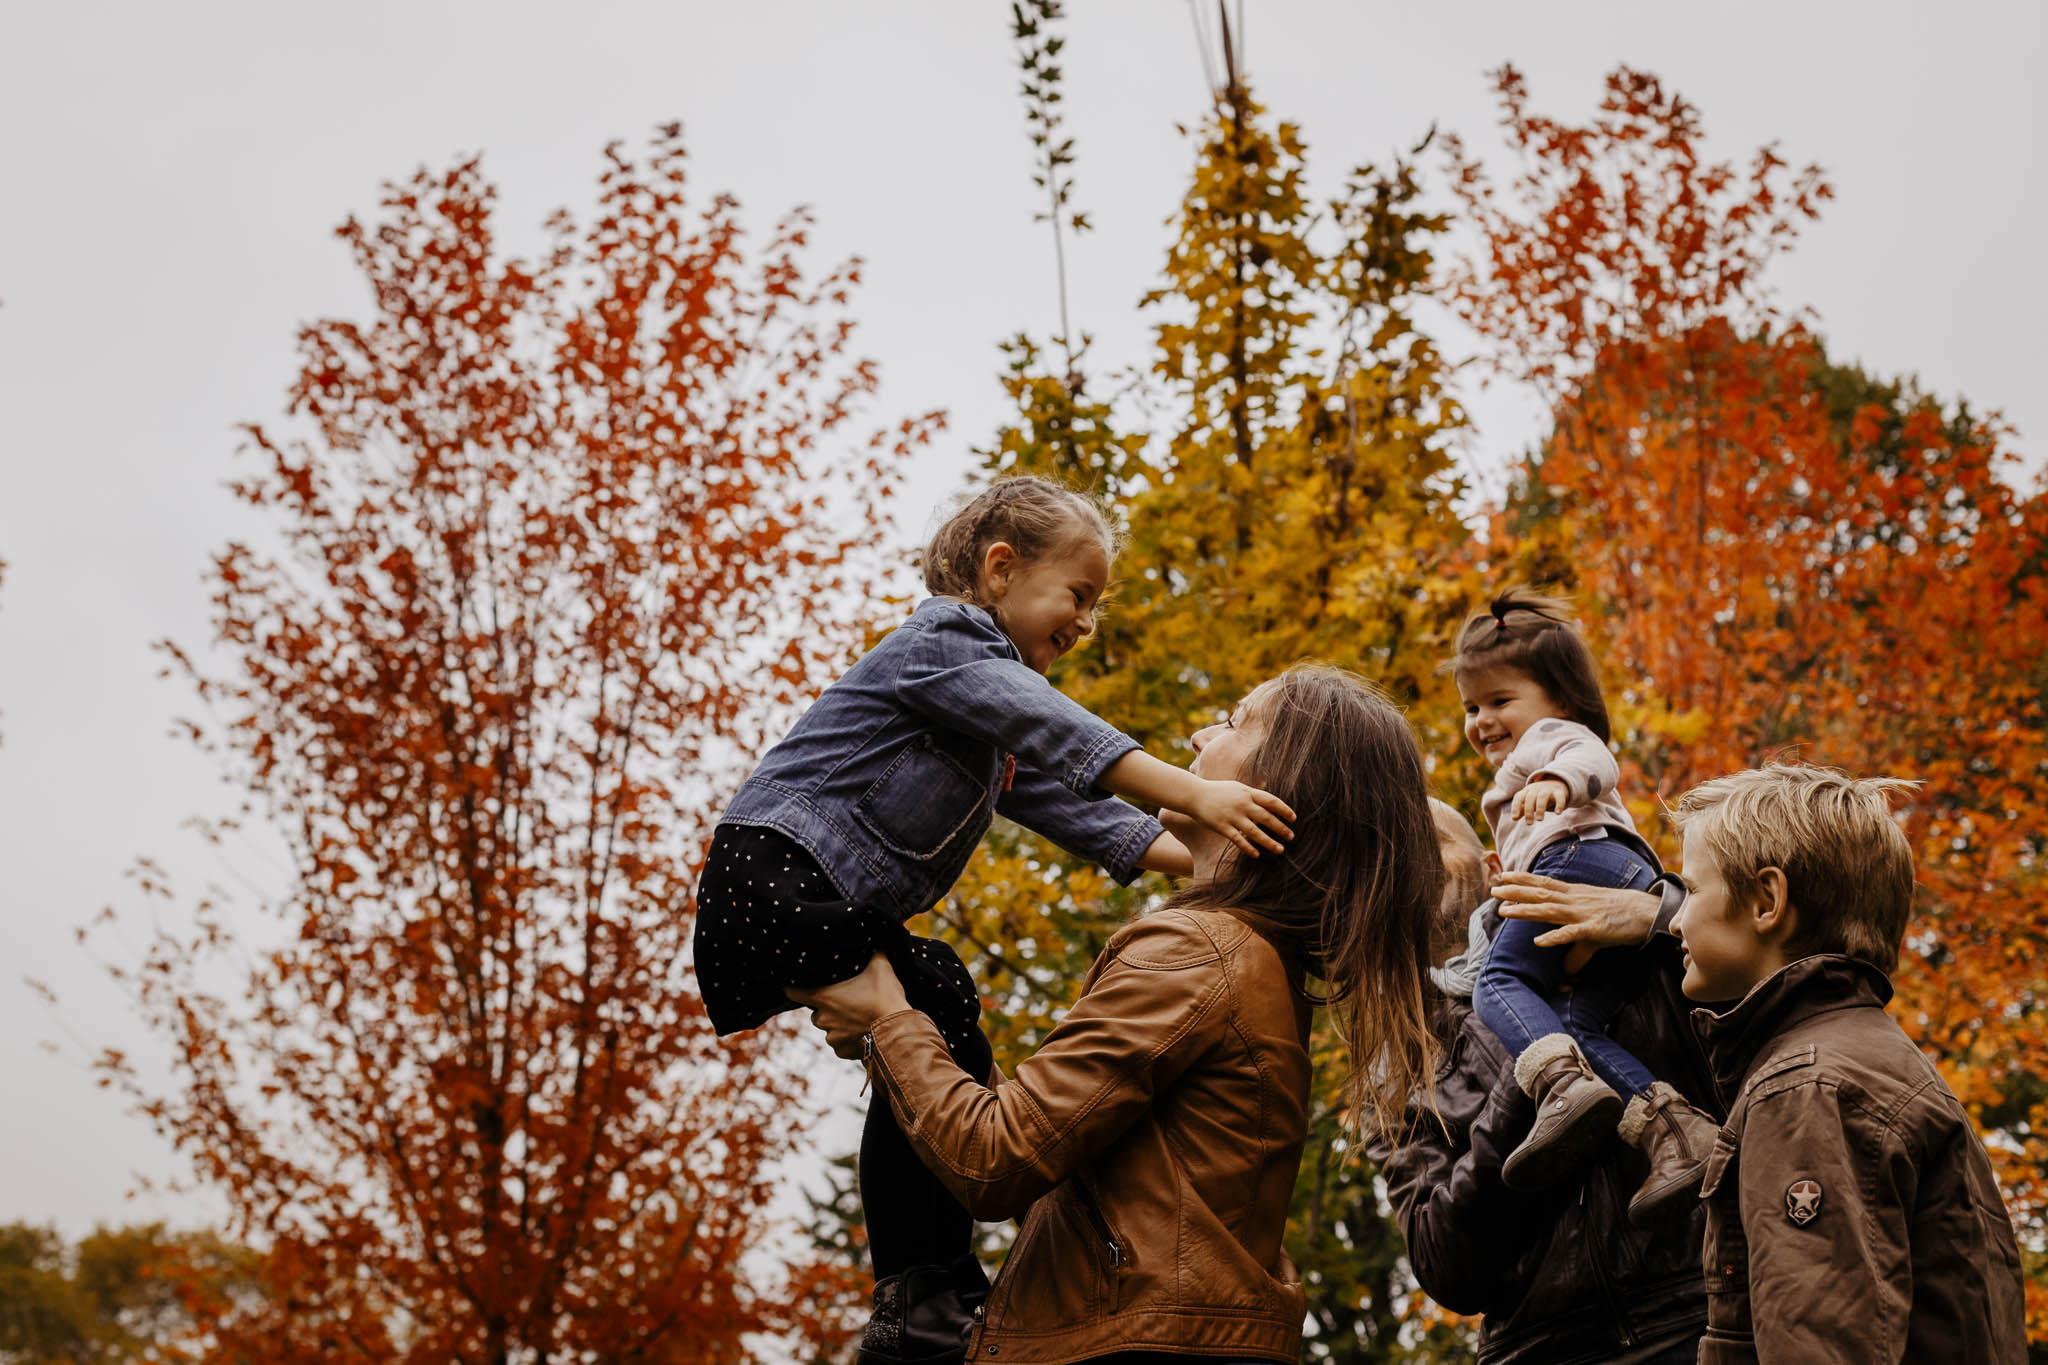 famille-lyon-parc-ingold-4.jpg